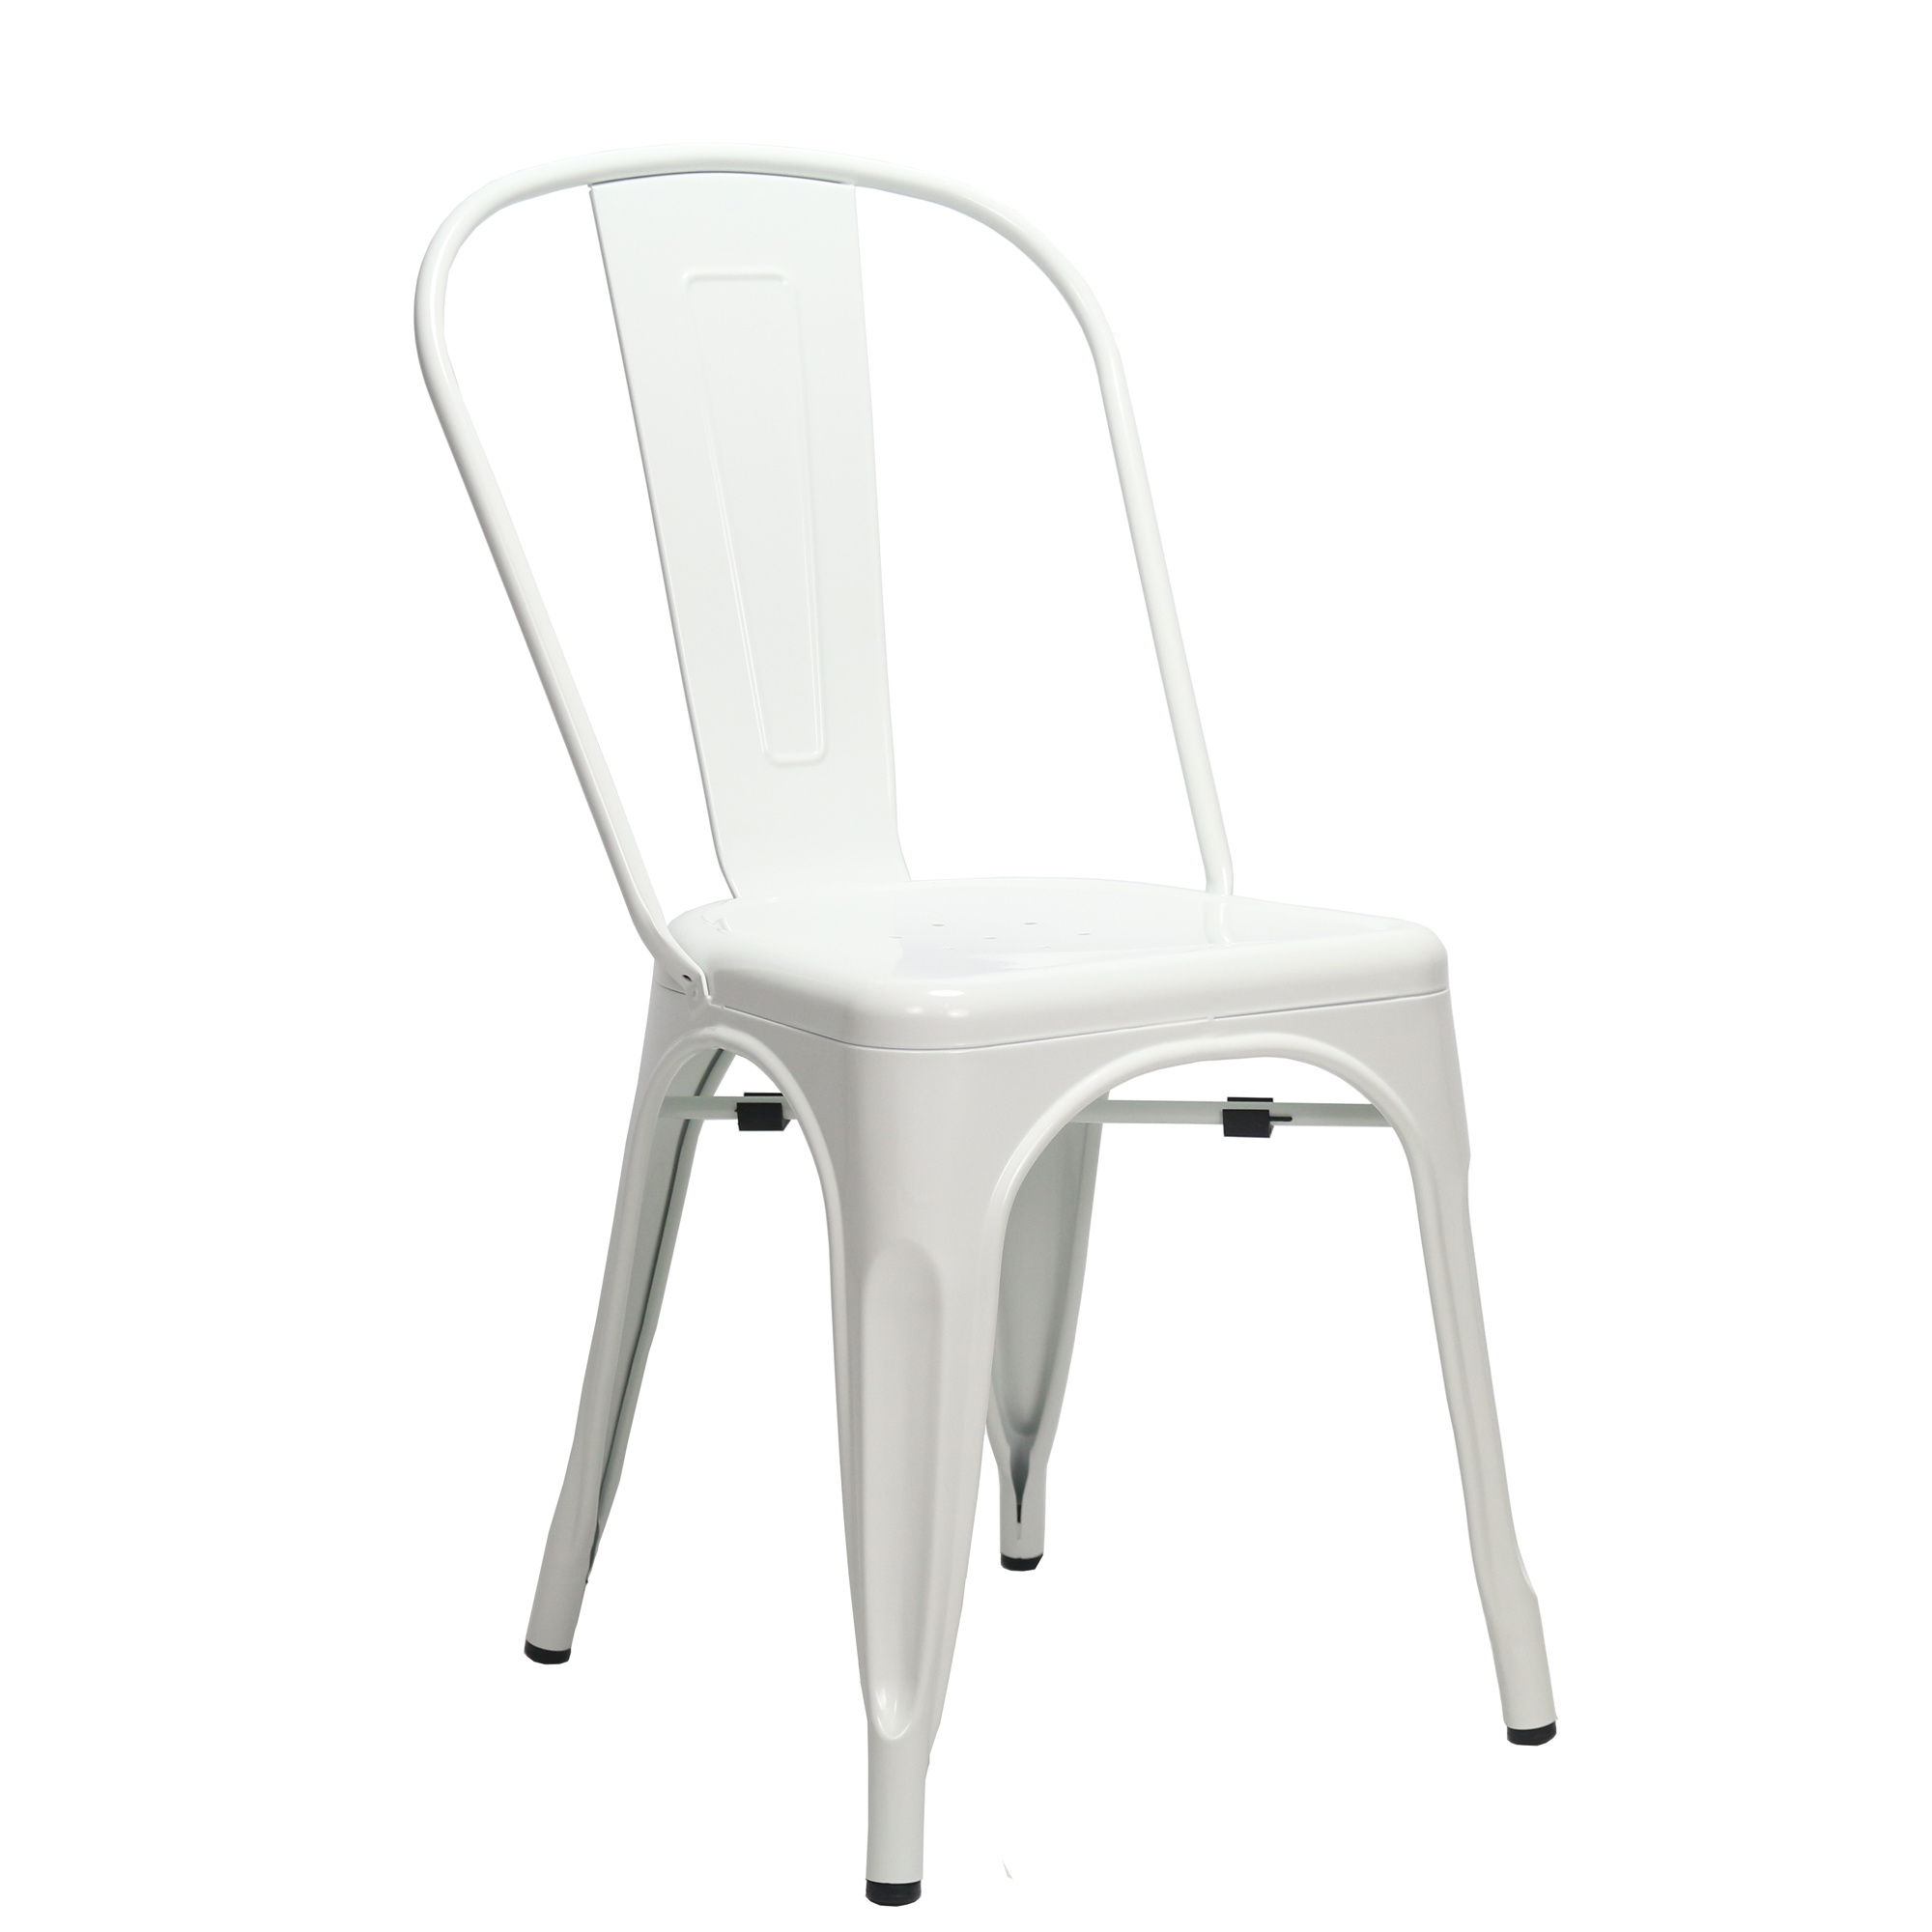 Industriële retro stoel Blade wit | MEGA DEAL